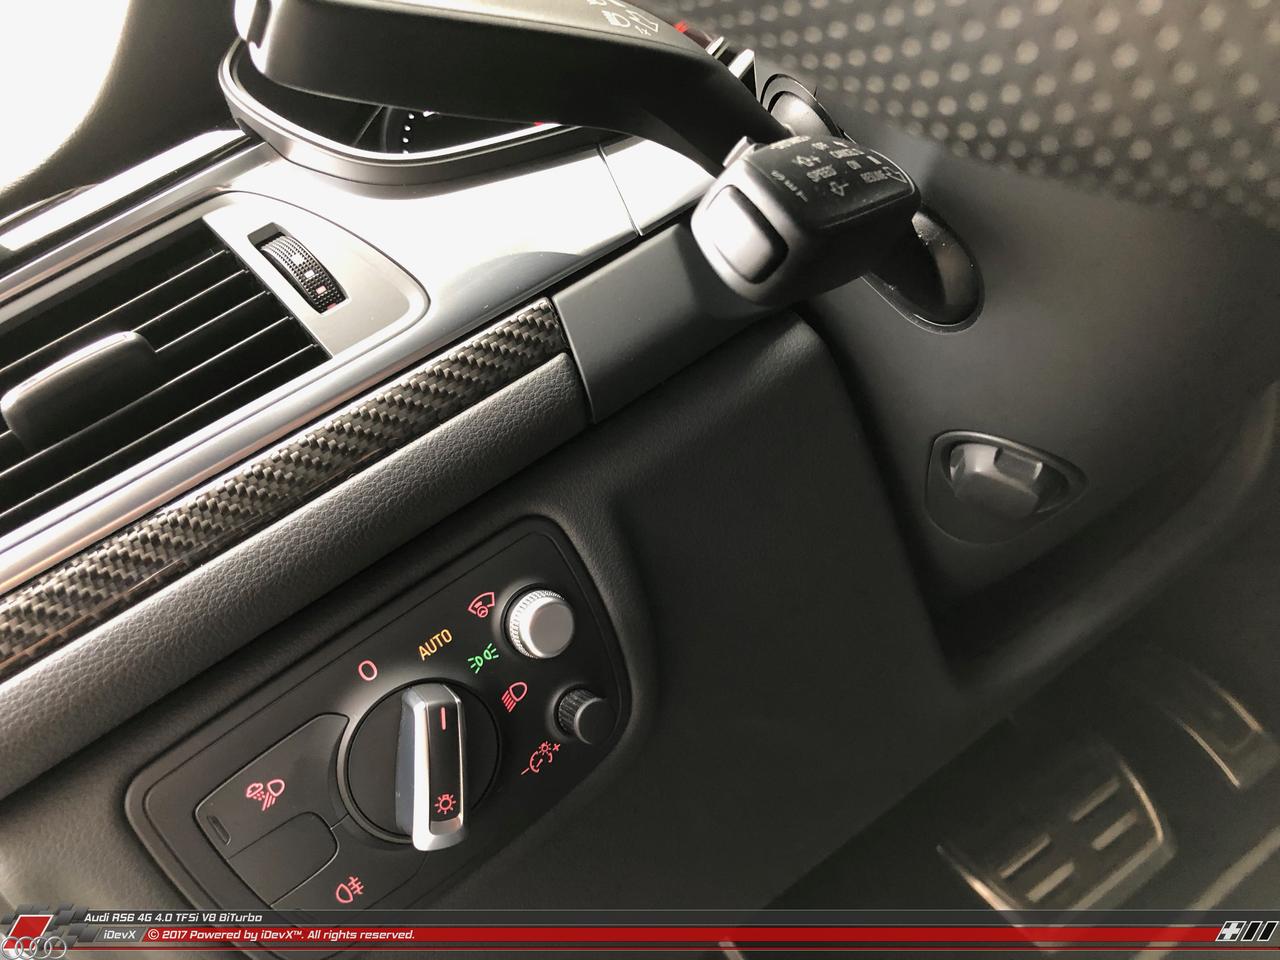 10_11.2018_Audi-RS6_iDevX_012.png